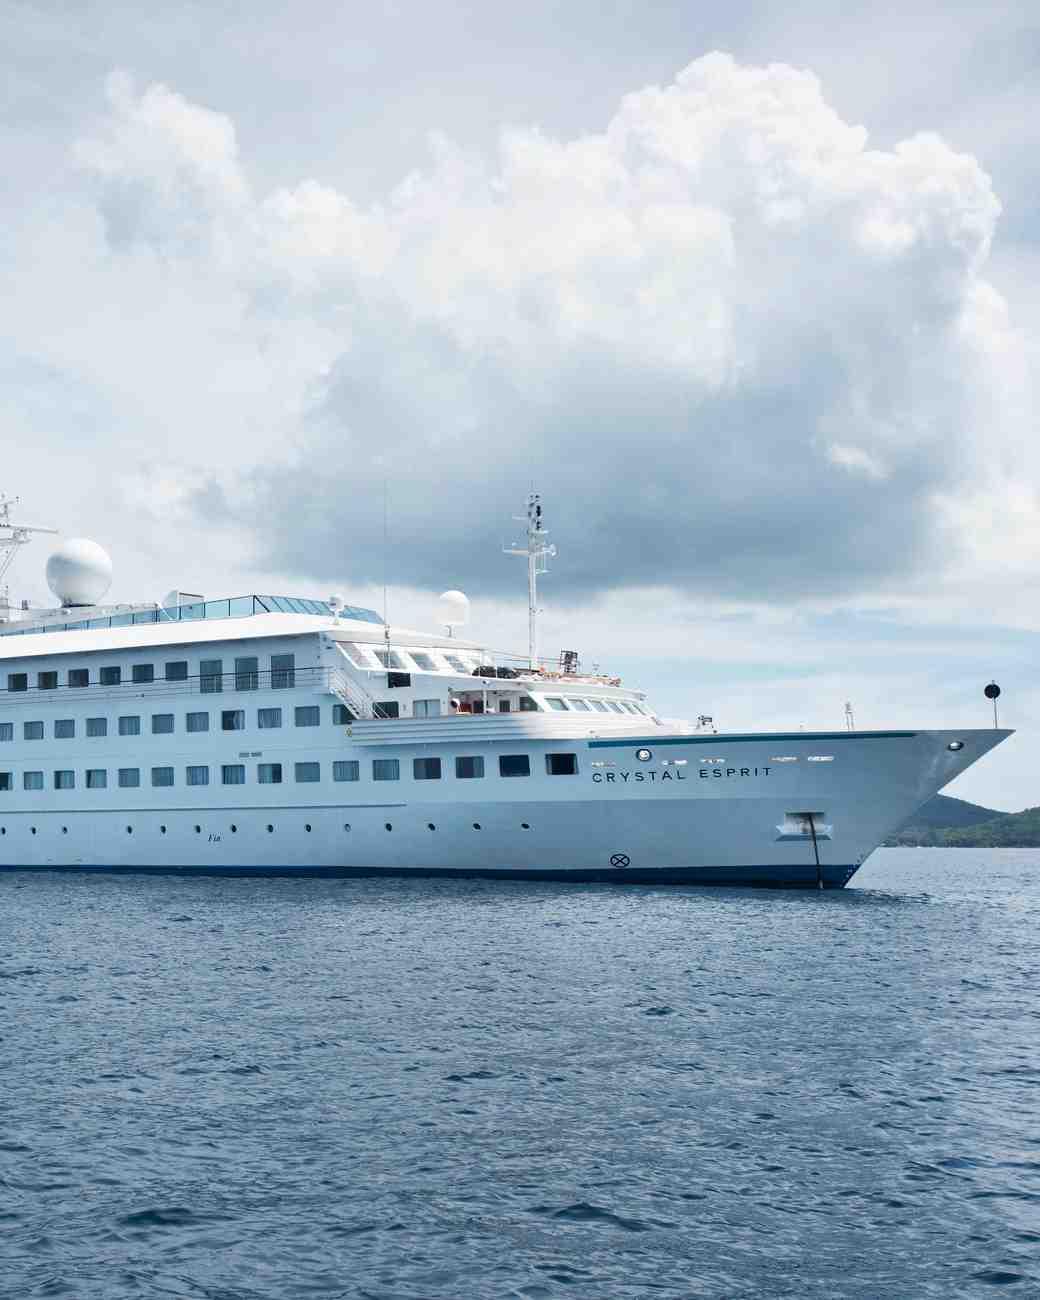 honeymoon-cruises-crystal-cruises-0416.jpg